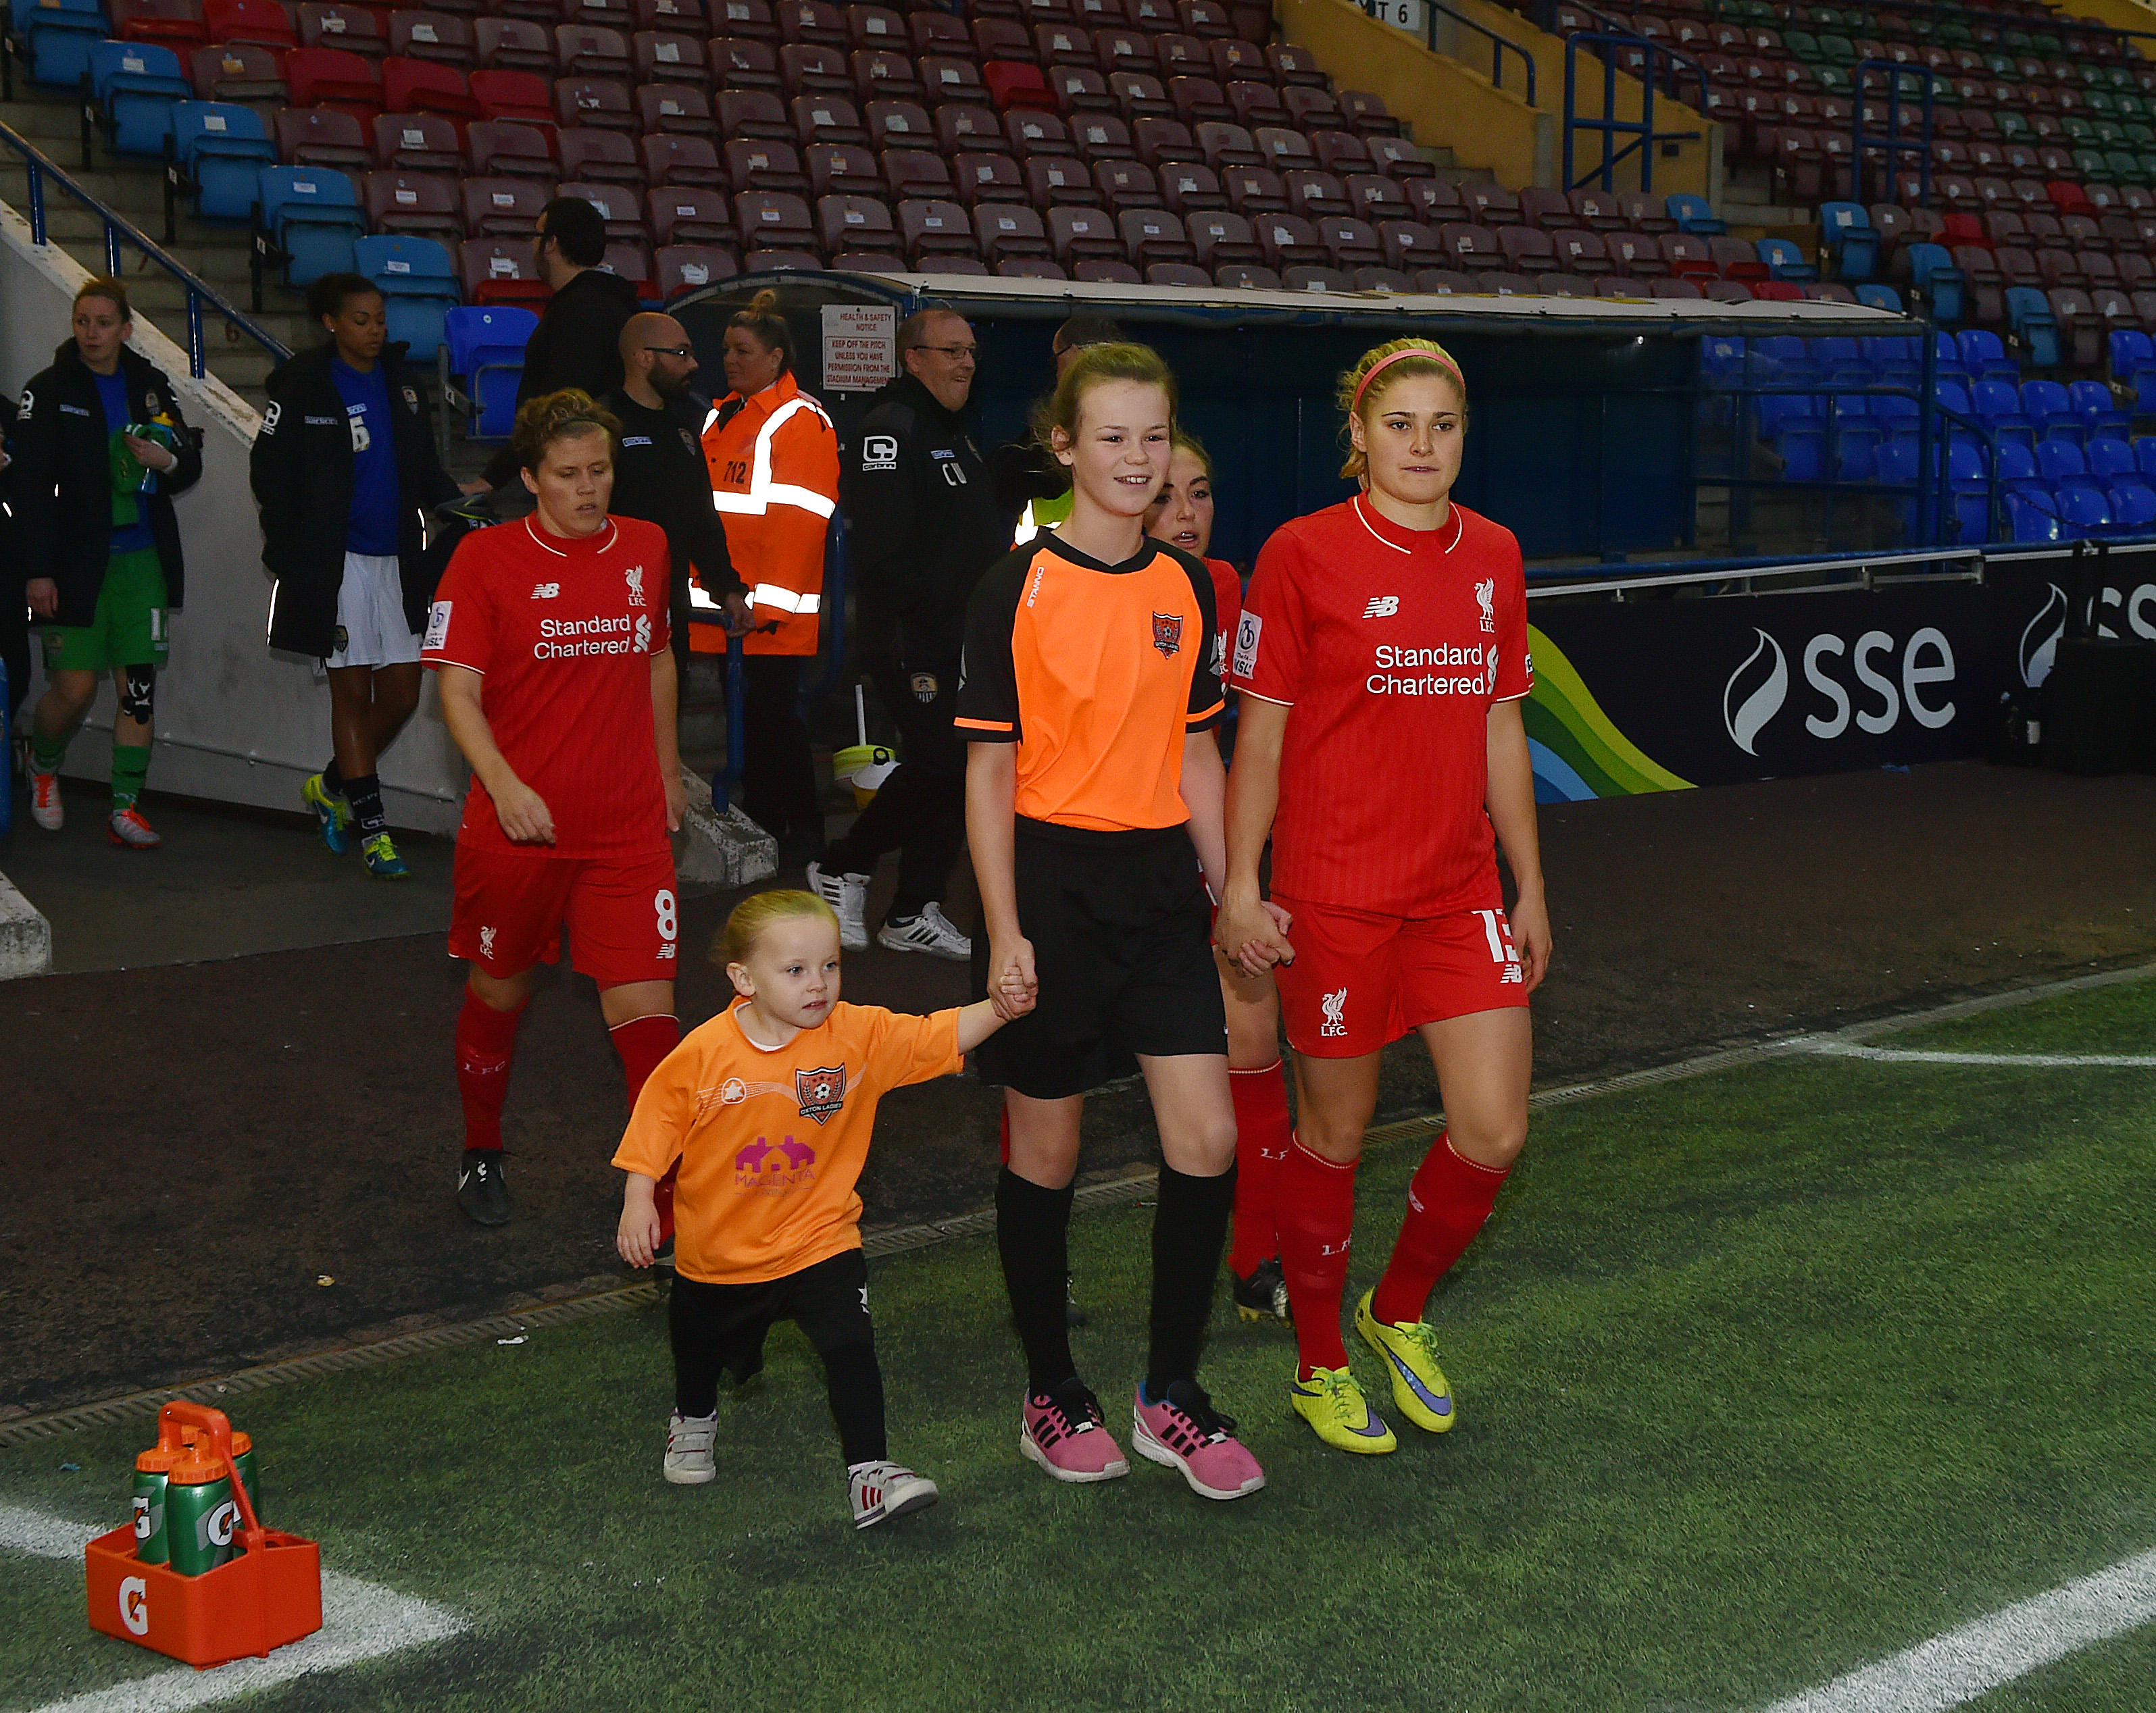 11.10.15 Liverpool Ladies Mascot 10